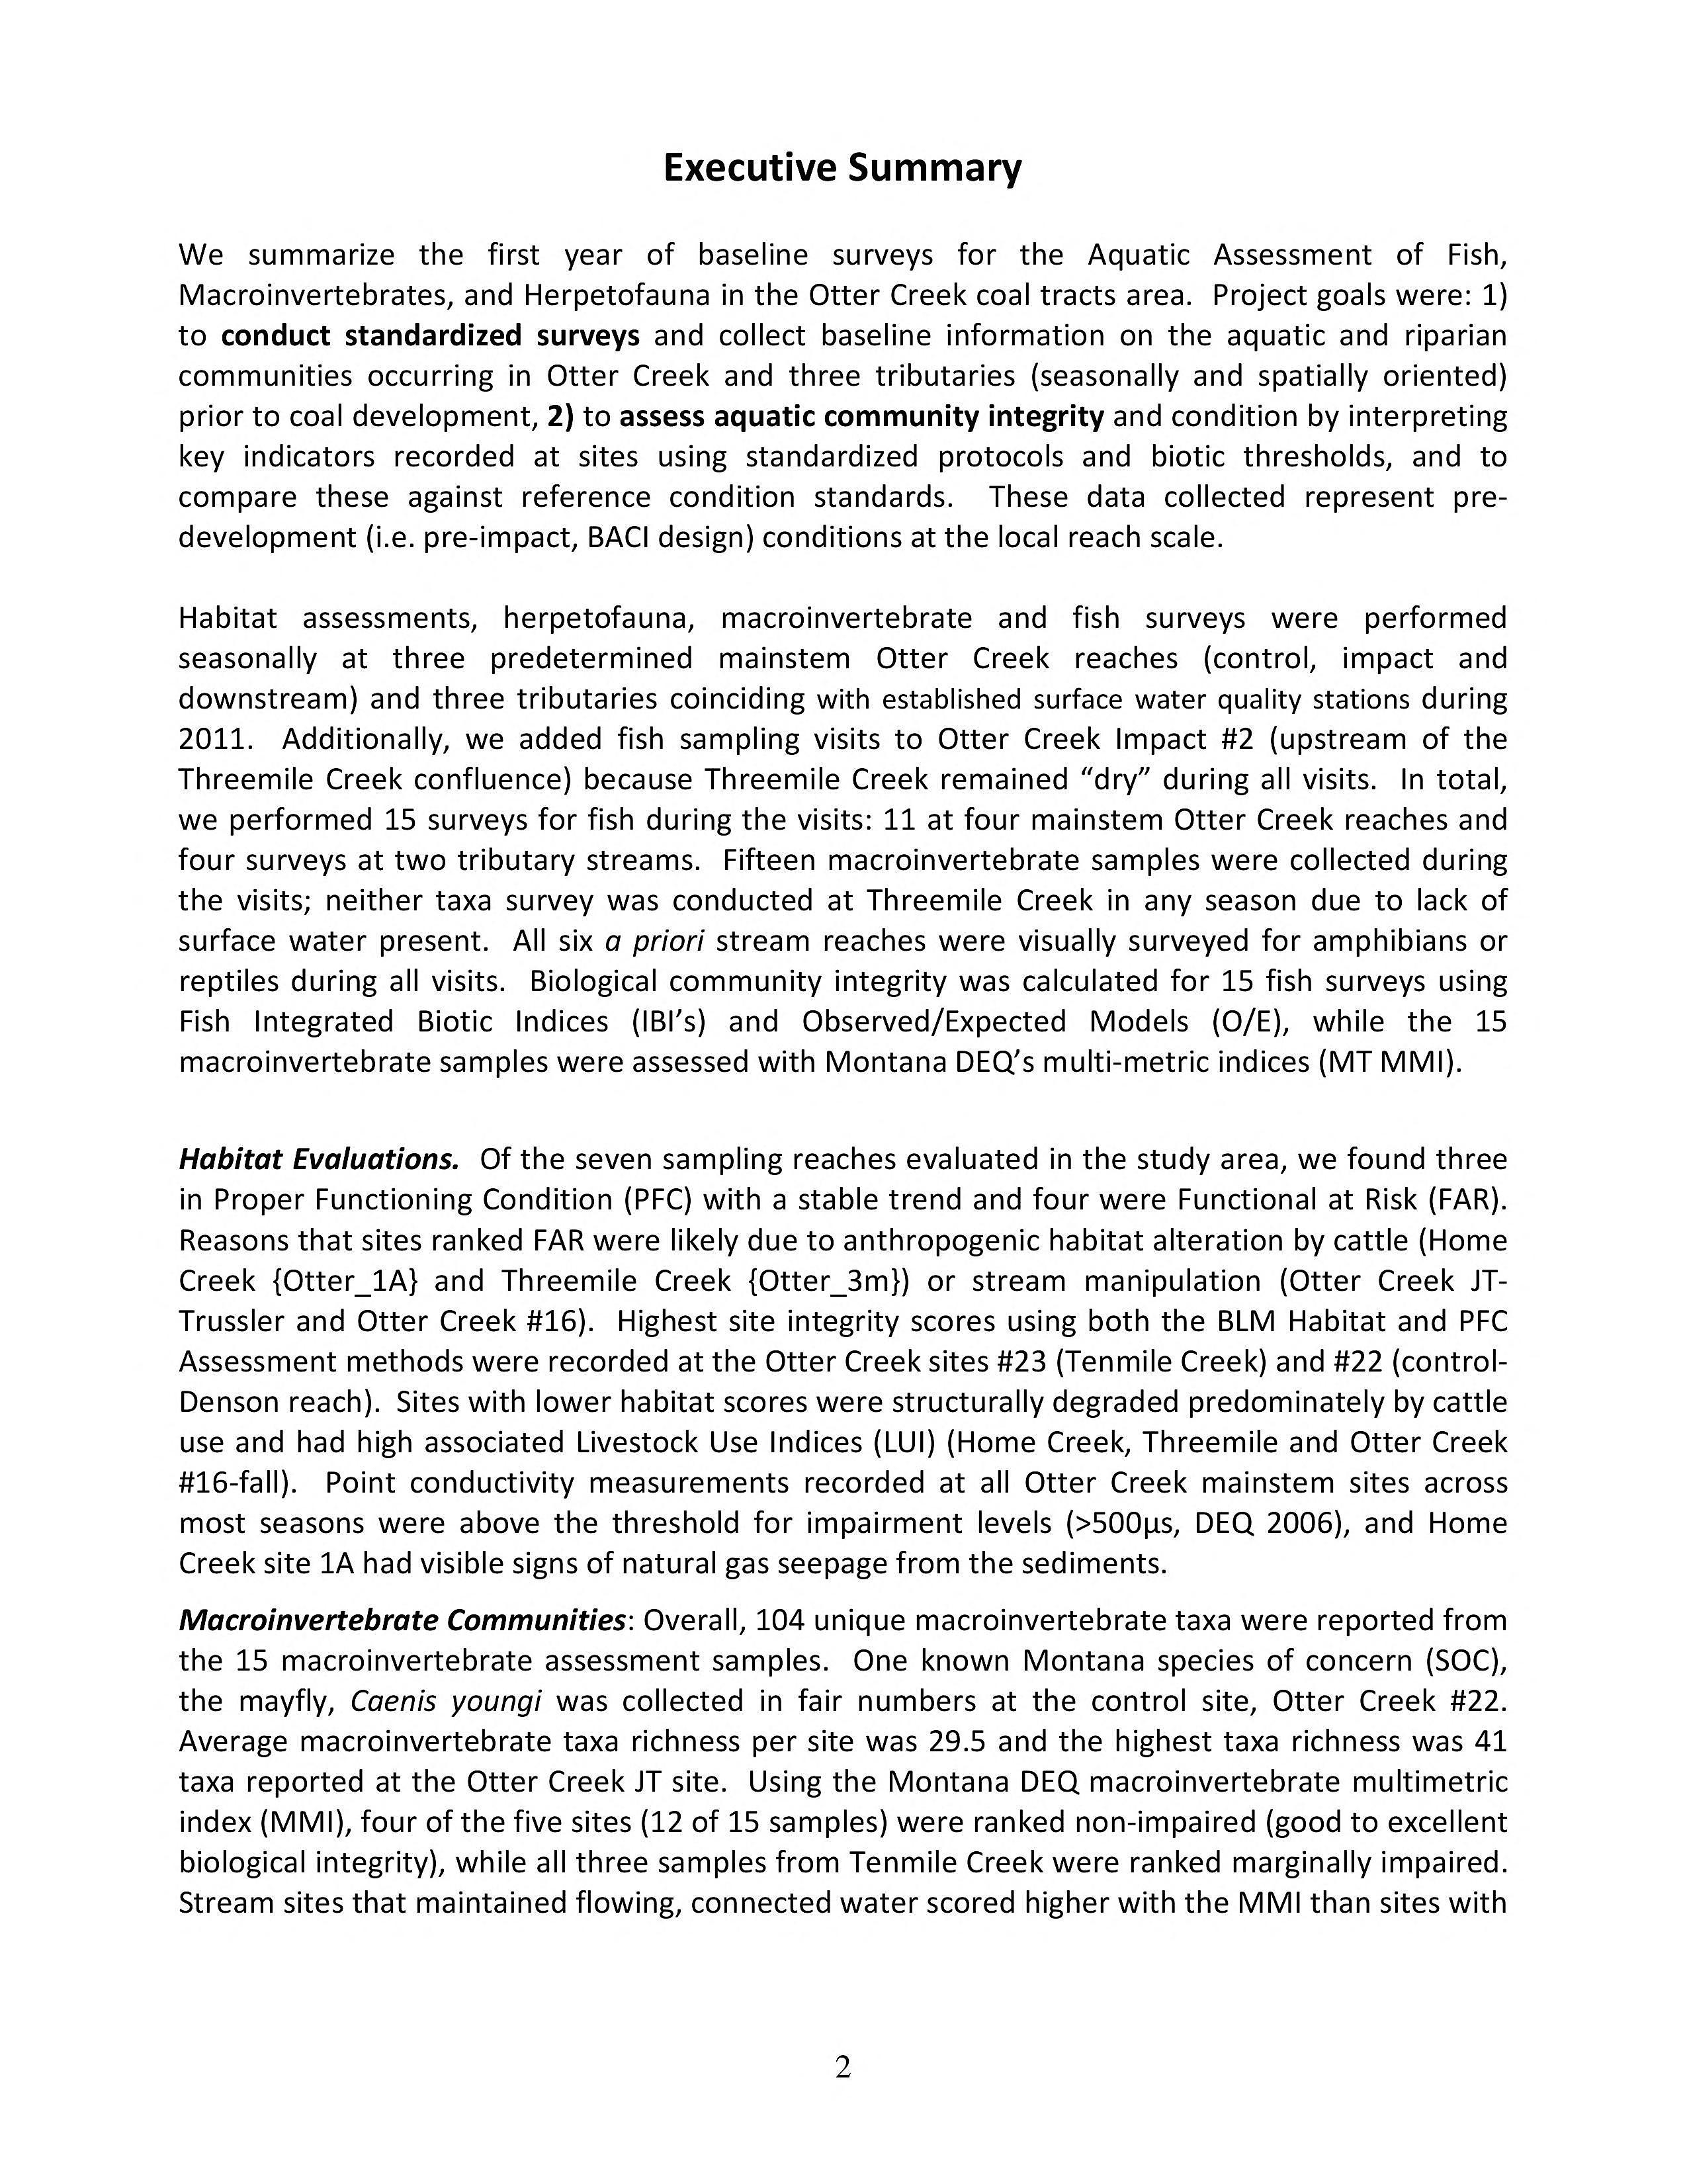 Baseline assessment and analysis of fish, macroinvertebrates and herpetofauna ...